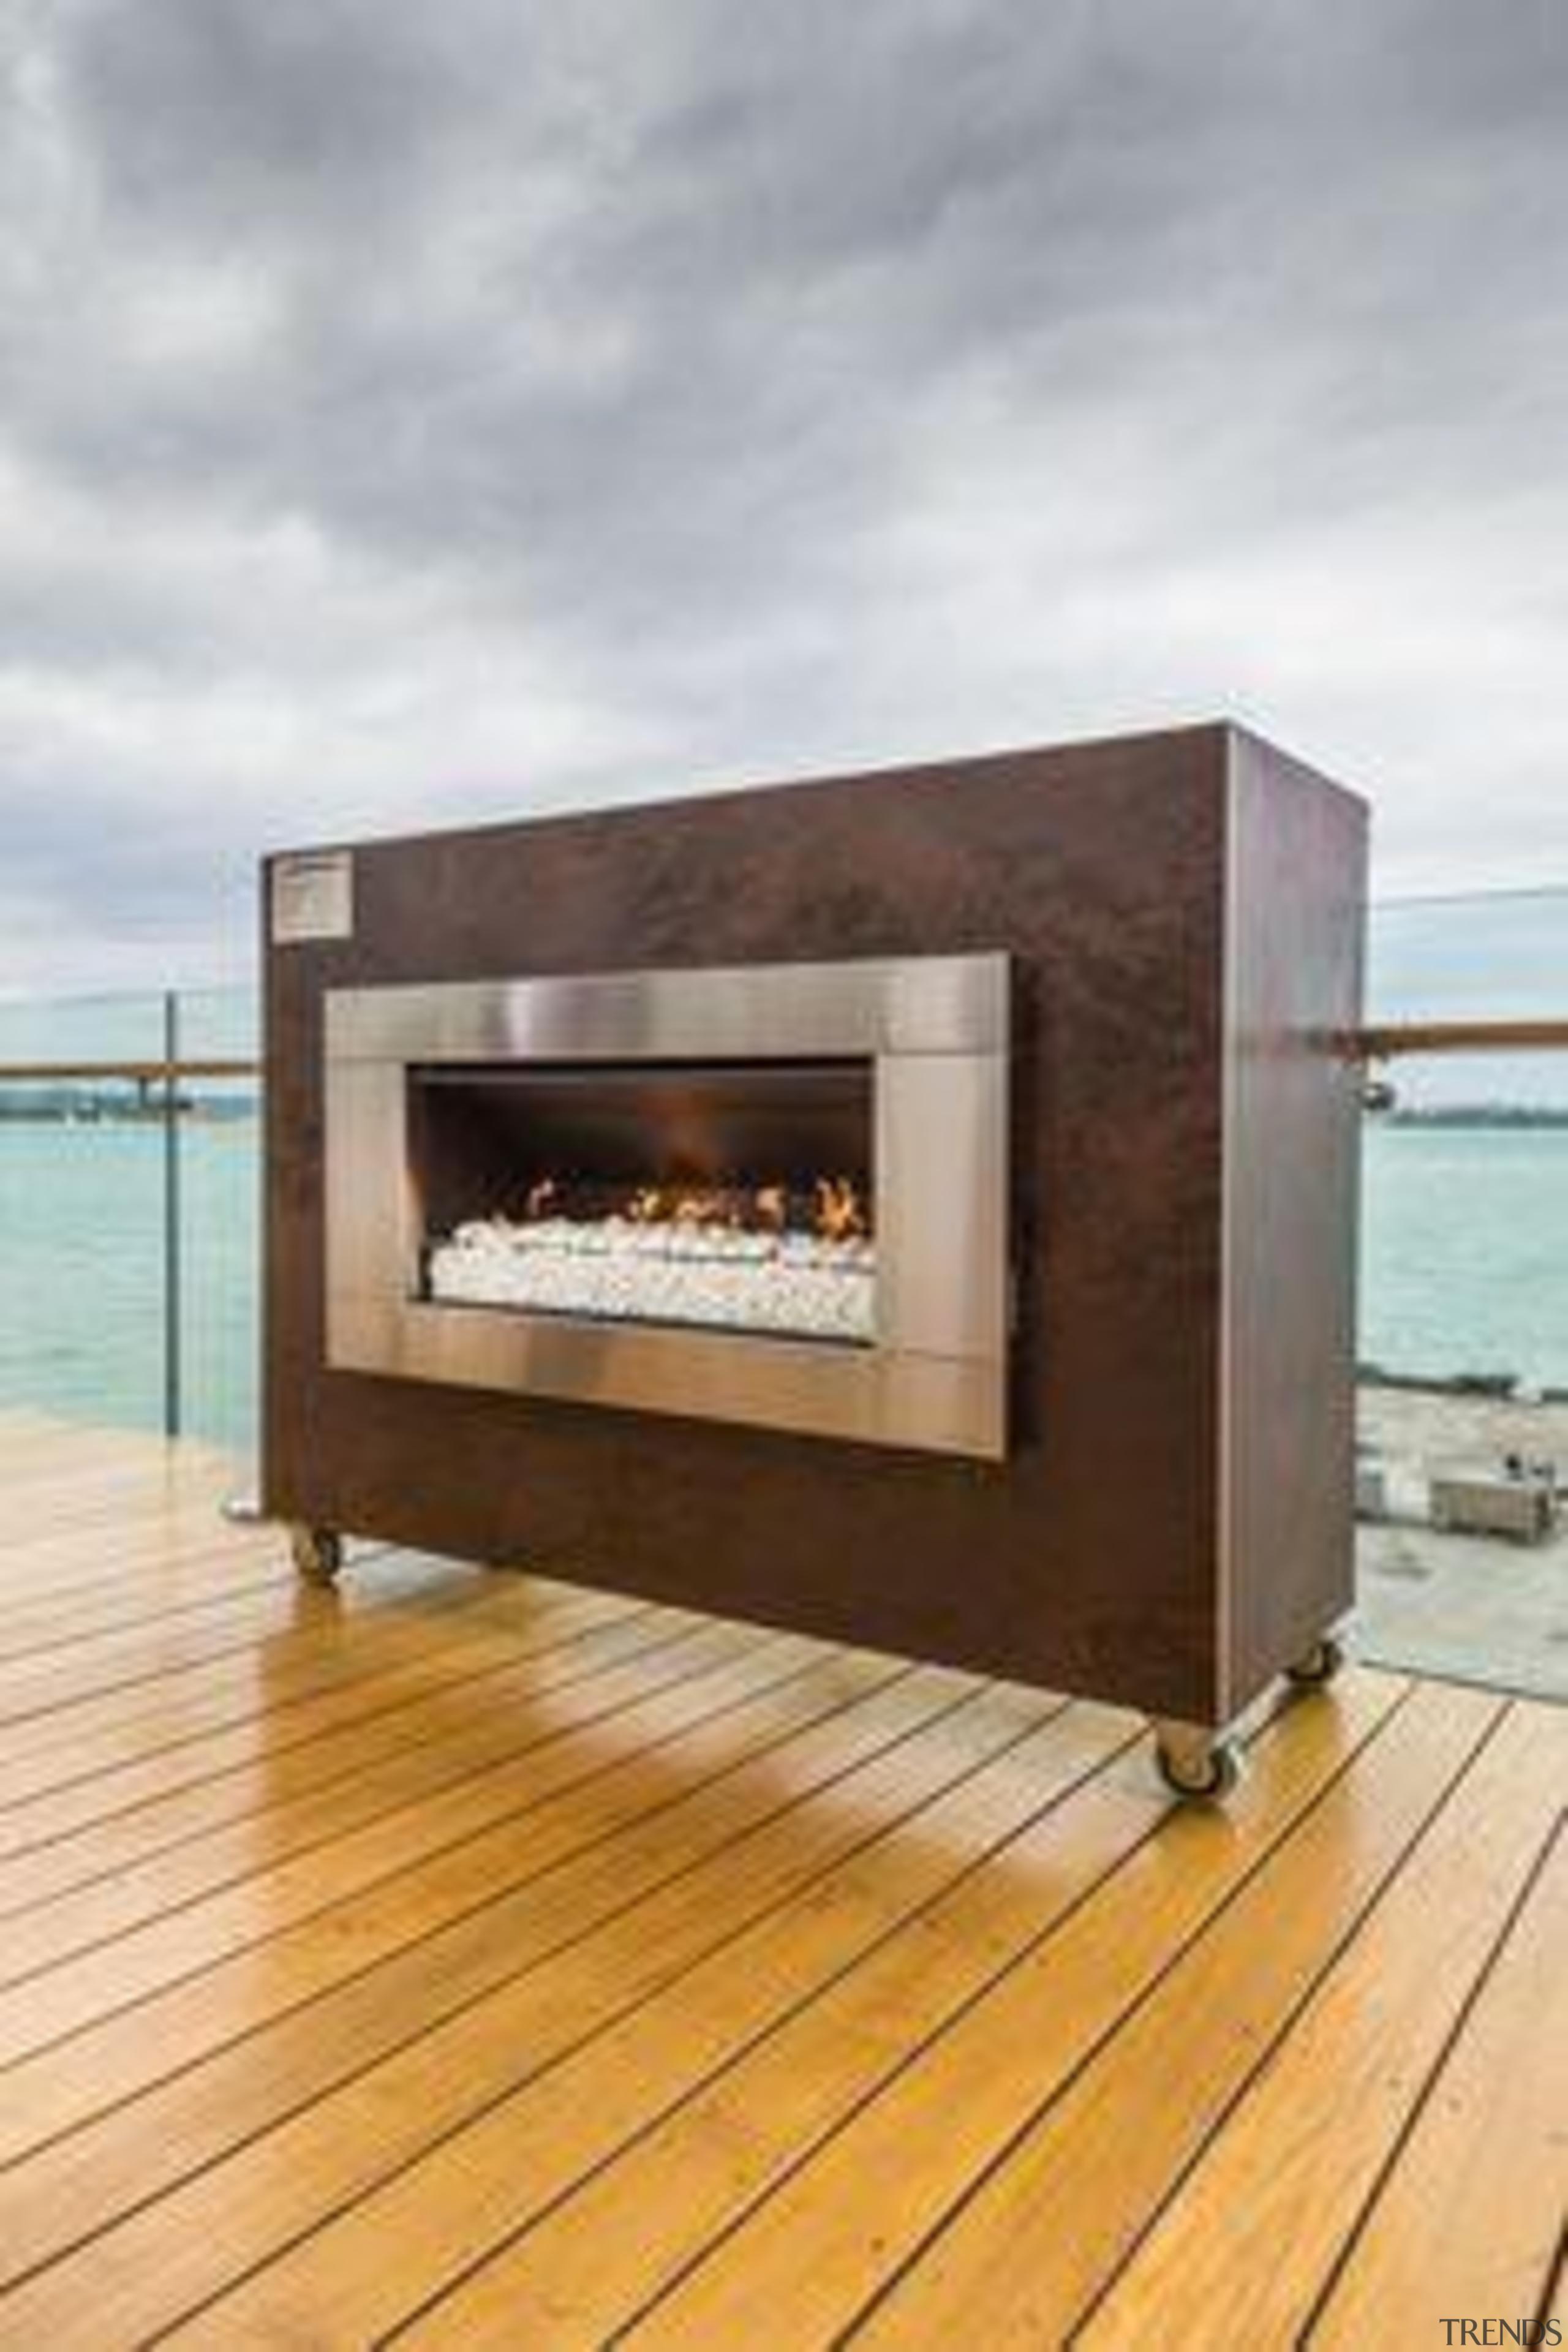 Escea fireplace, clad in Laminam Oxide Moro. - fireplace, gray, orange